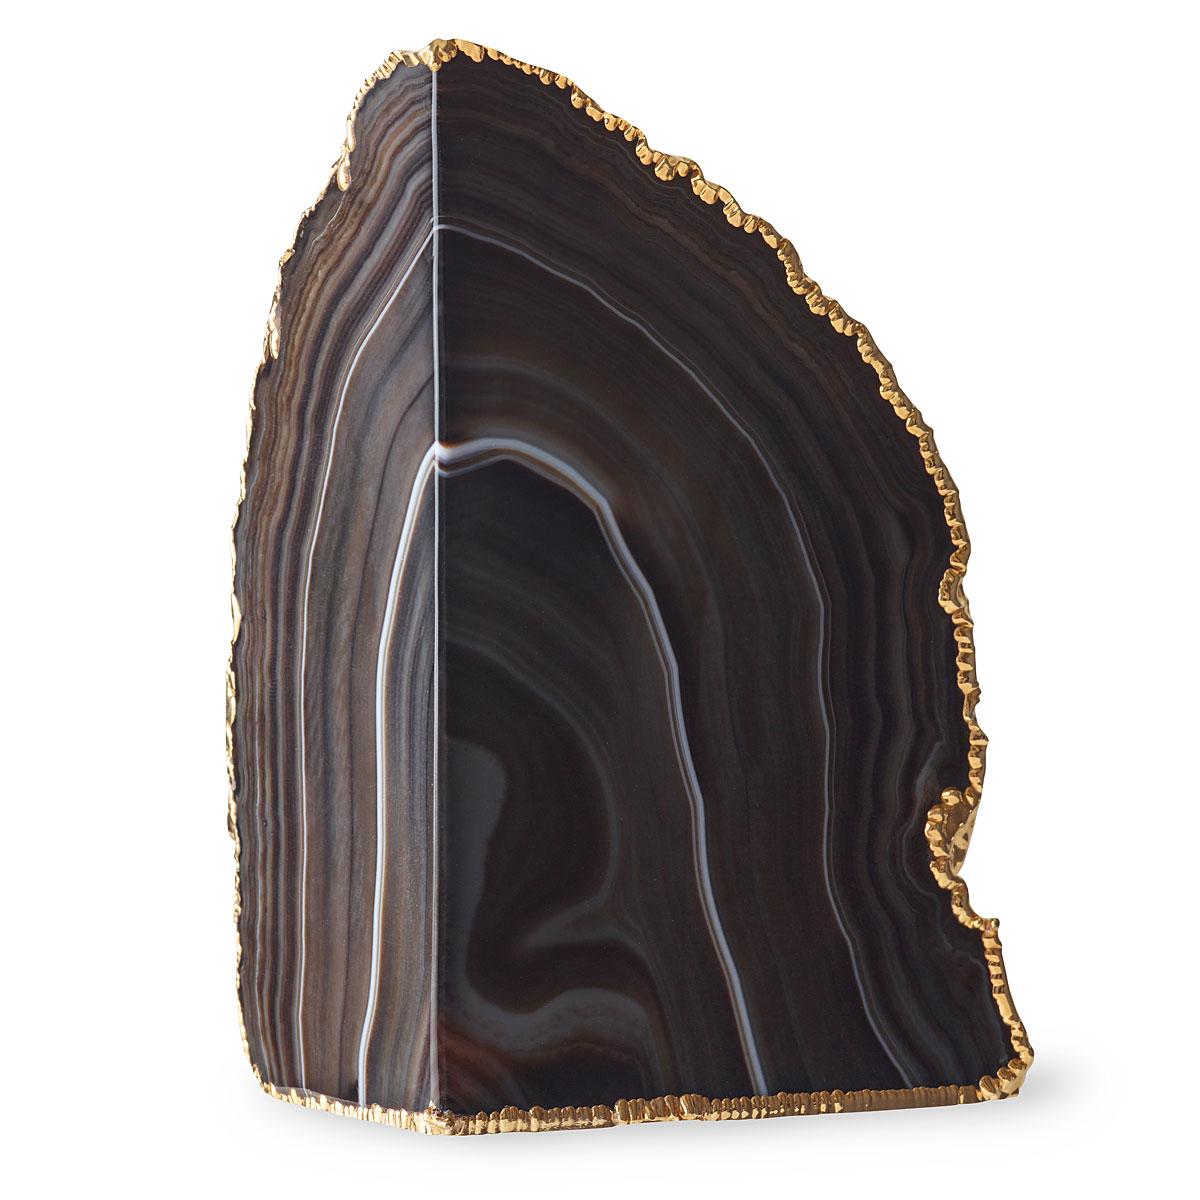 Aerin Agate Geode, Black